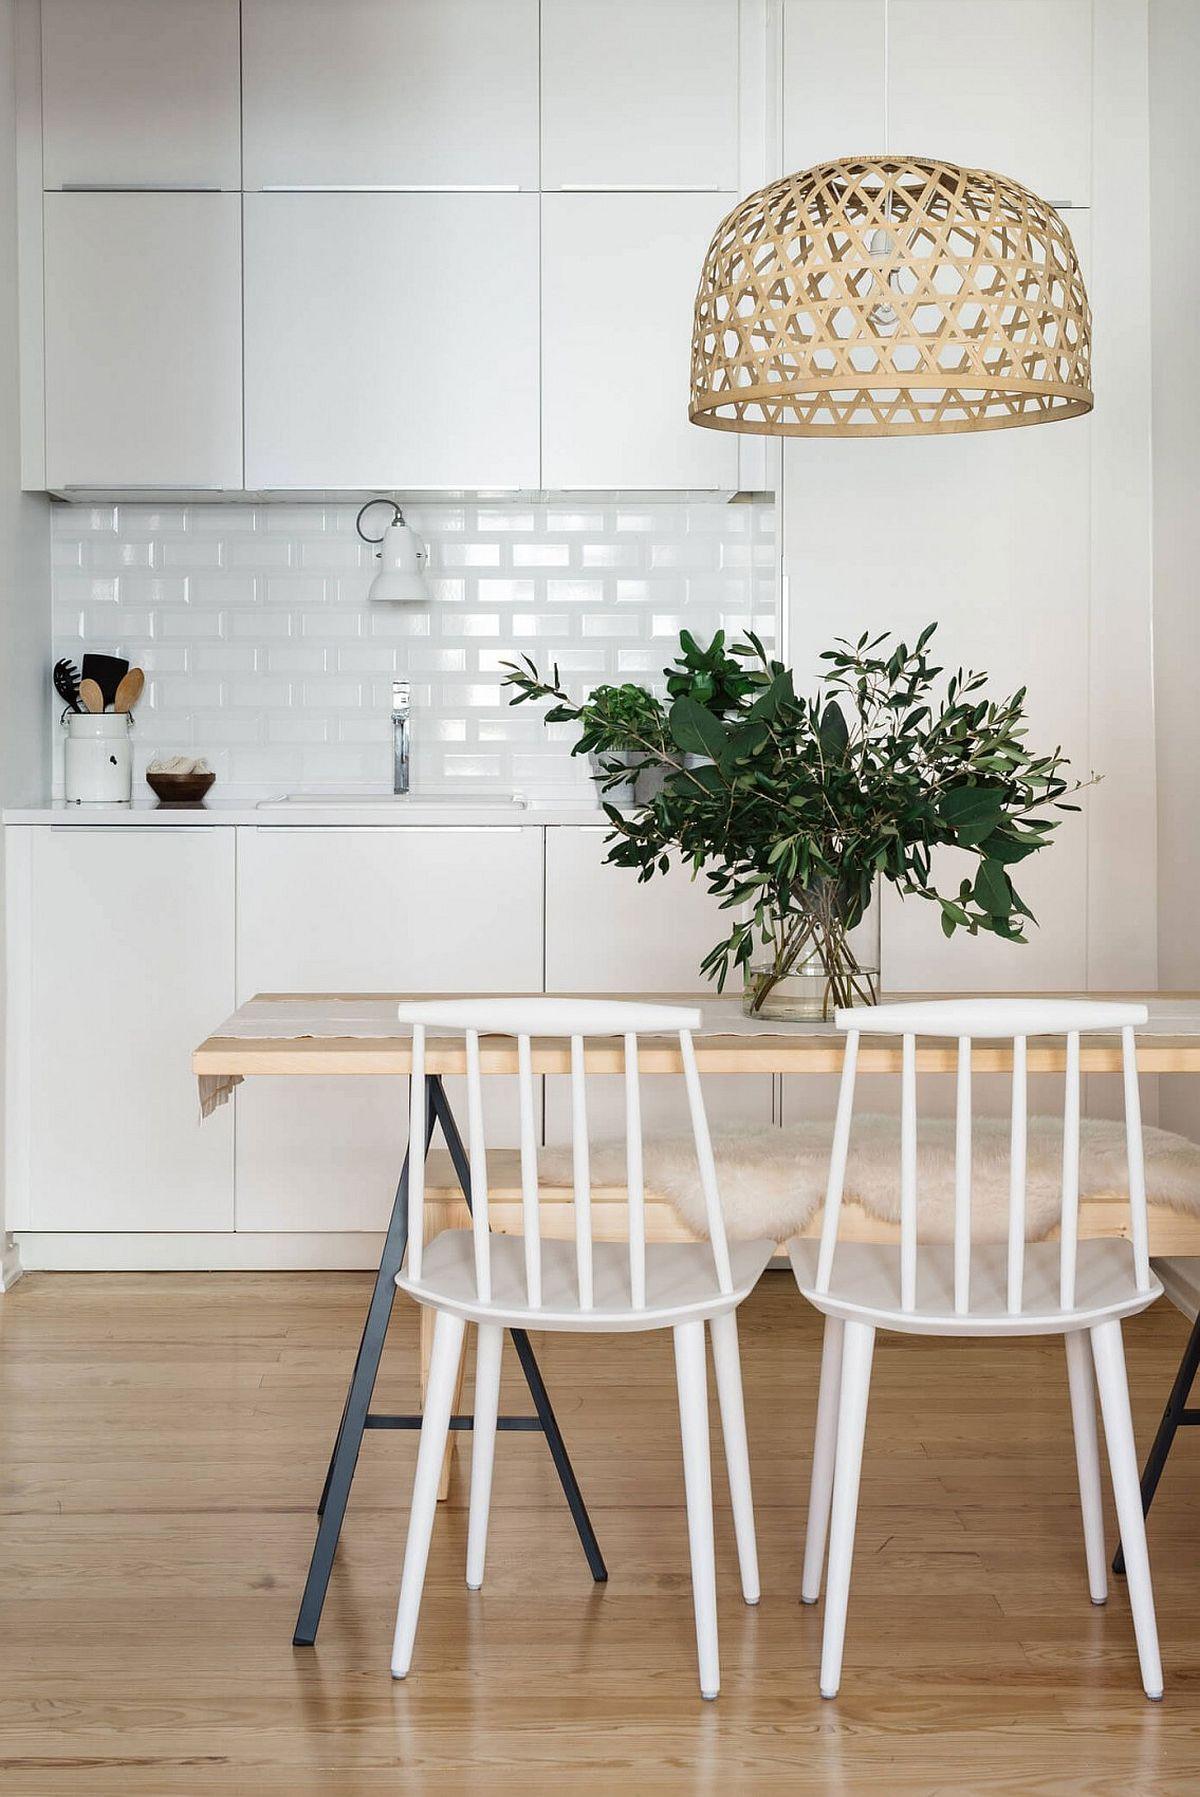 Unique lighting fixture wooden table and sleek